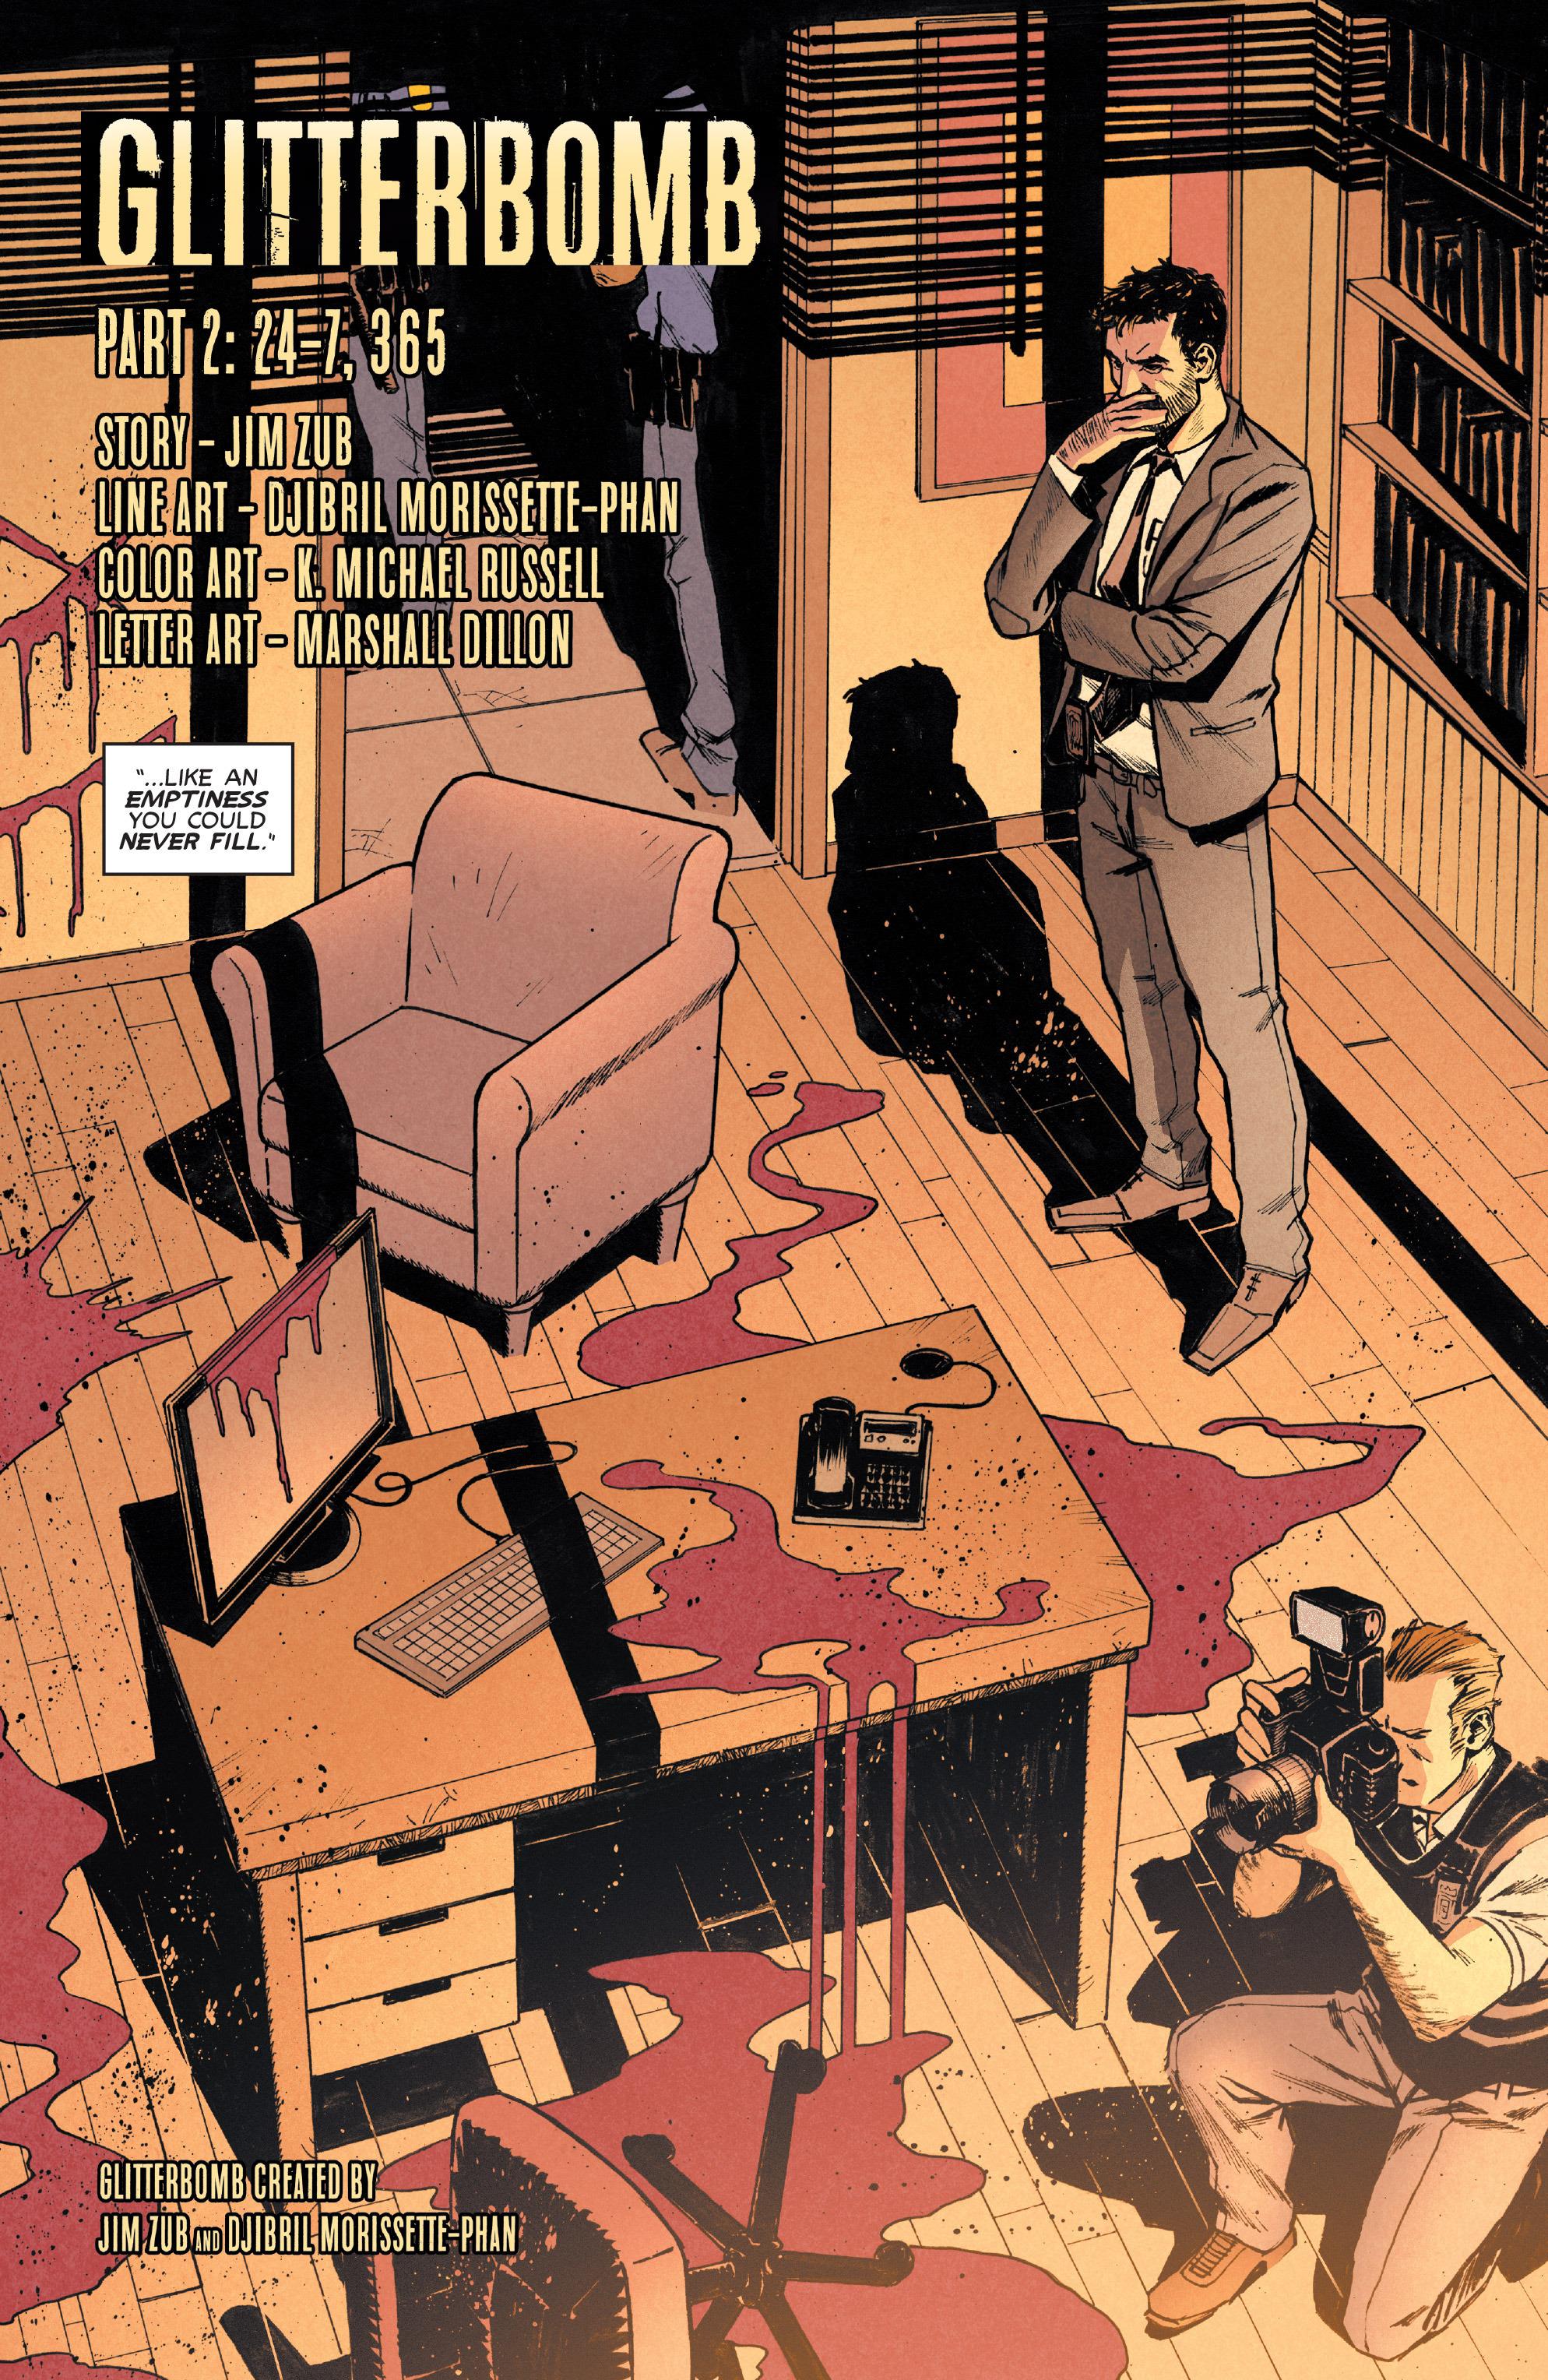 Read online Glitterbomb comic -  Issue #2 - 6